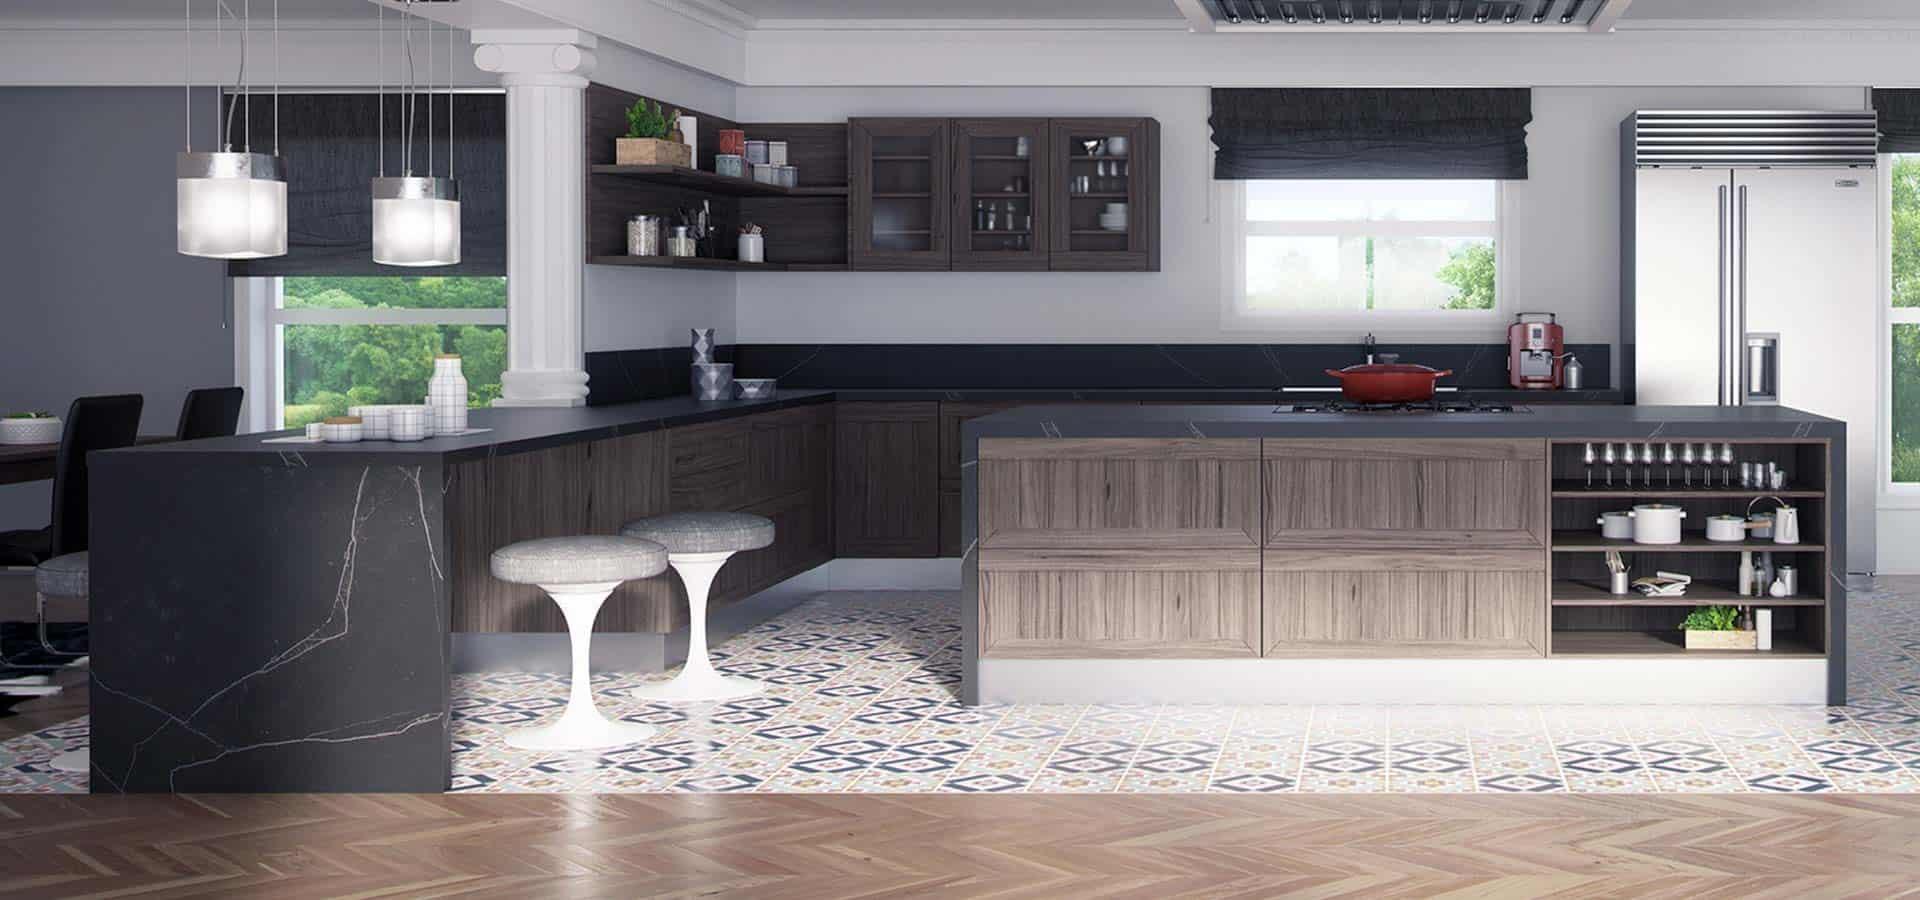 Cocinas de madera2